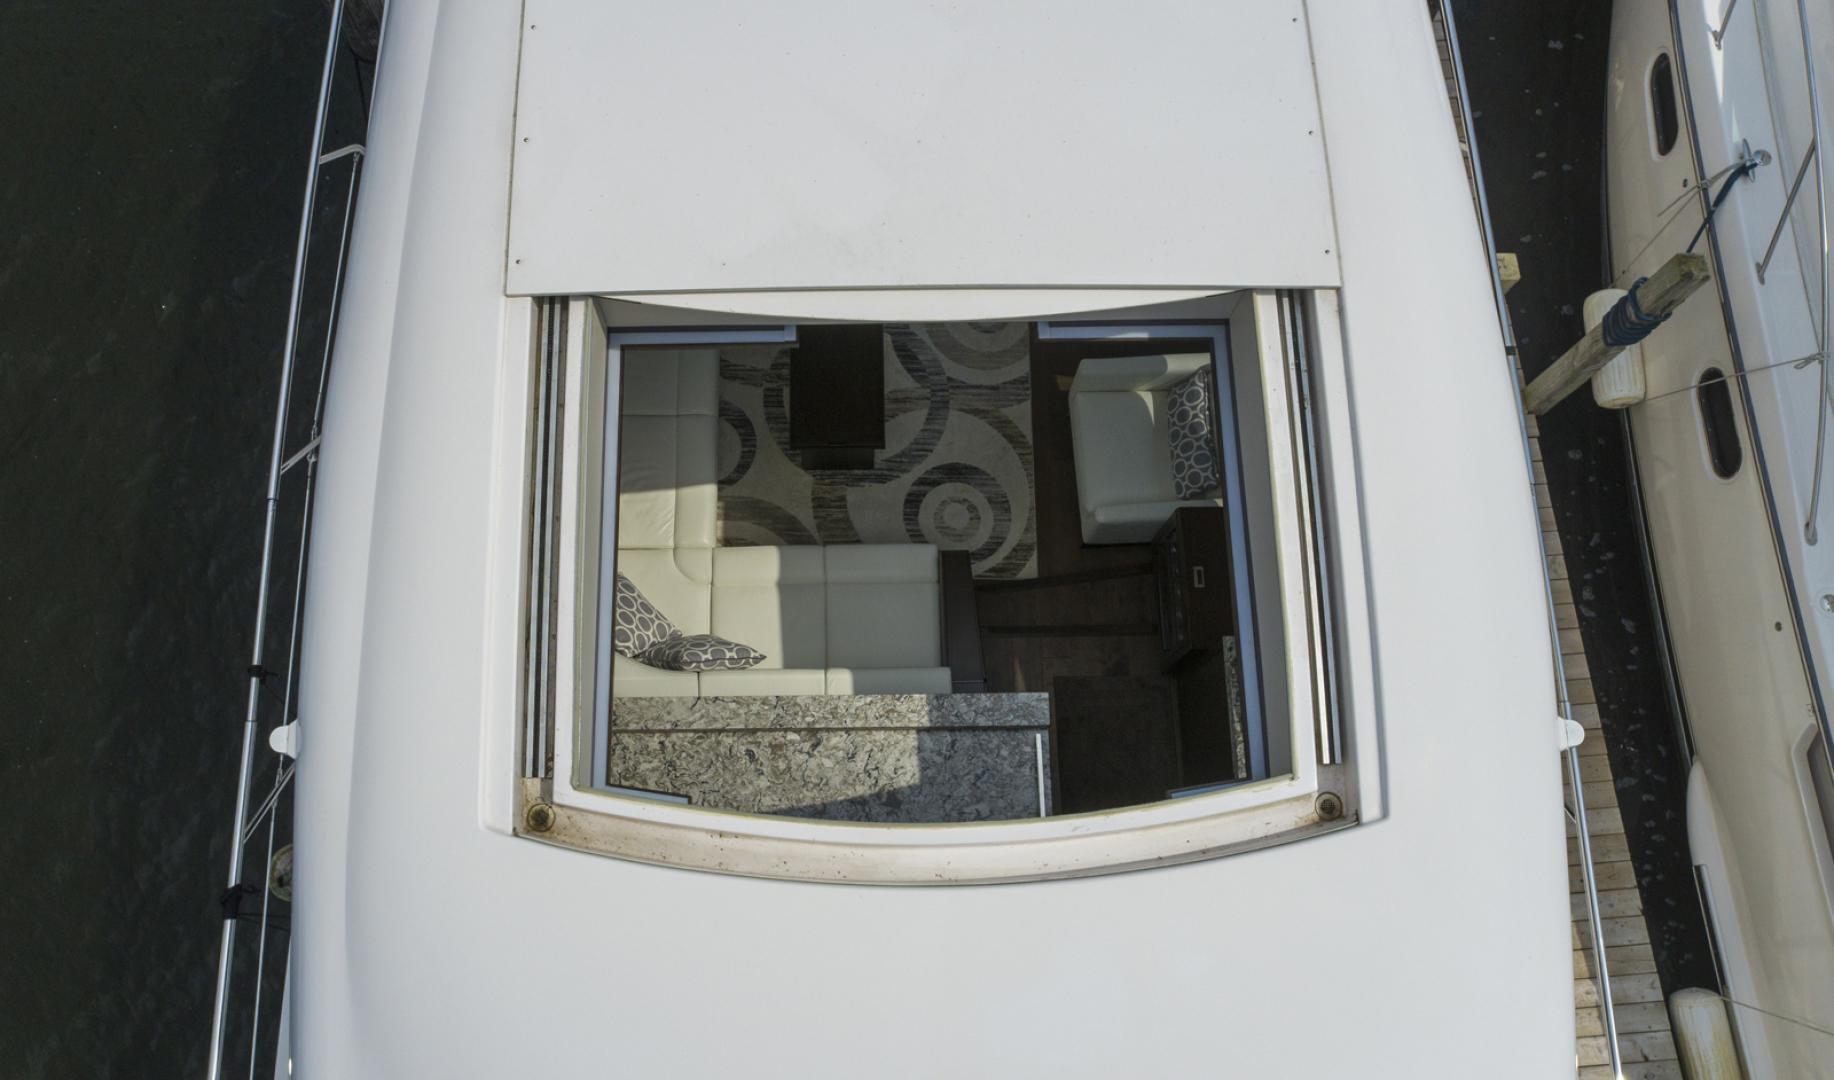 Neptunus-Motor Yacht Express 2018-LIQUID WISDOM Grand Haven-Michigan-United States-Sunroof-1485005 | Thumbnail